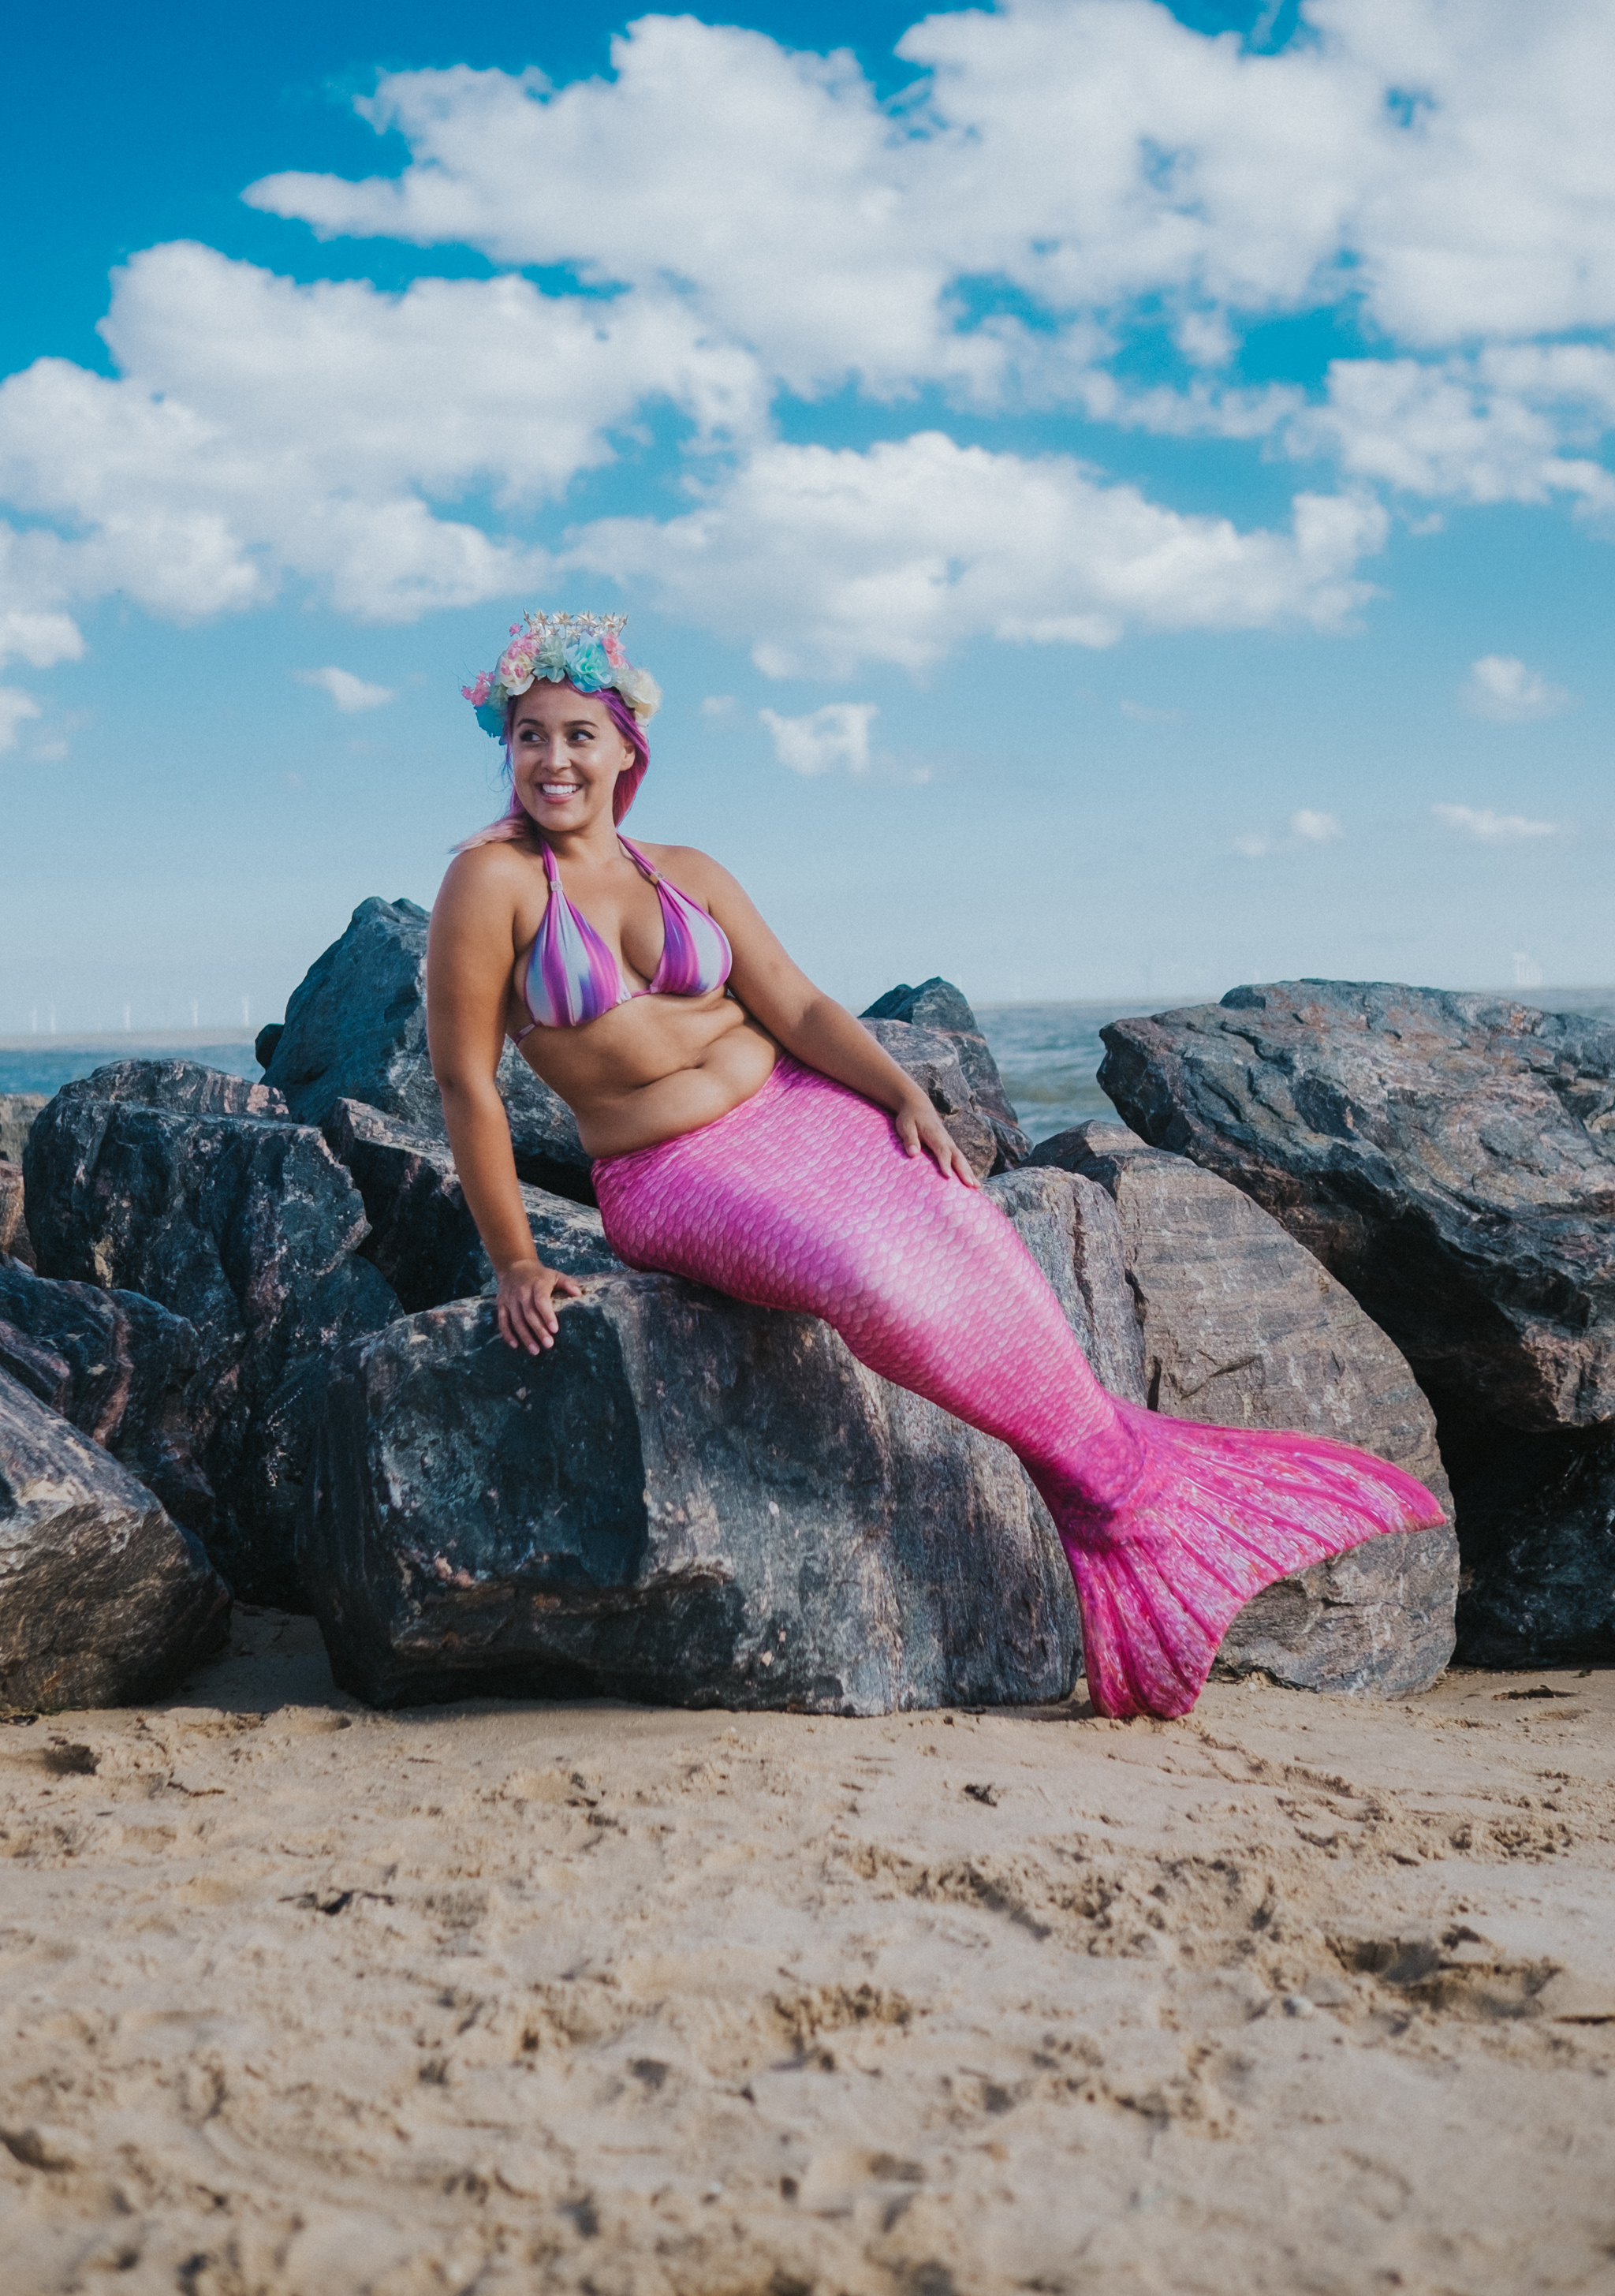 Body-Positive-Mermaids-Grace-Elizabeth-Mermaiding-UK-Alternative-Wedding-Photographer-Colchester-Essex-Suffolk-Norfolk-Devon (25 of 59).jpg